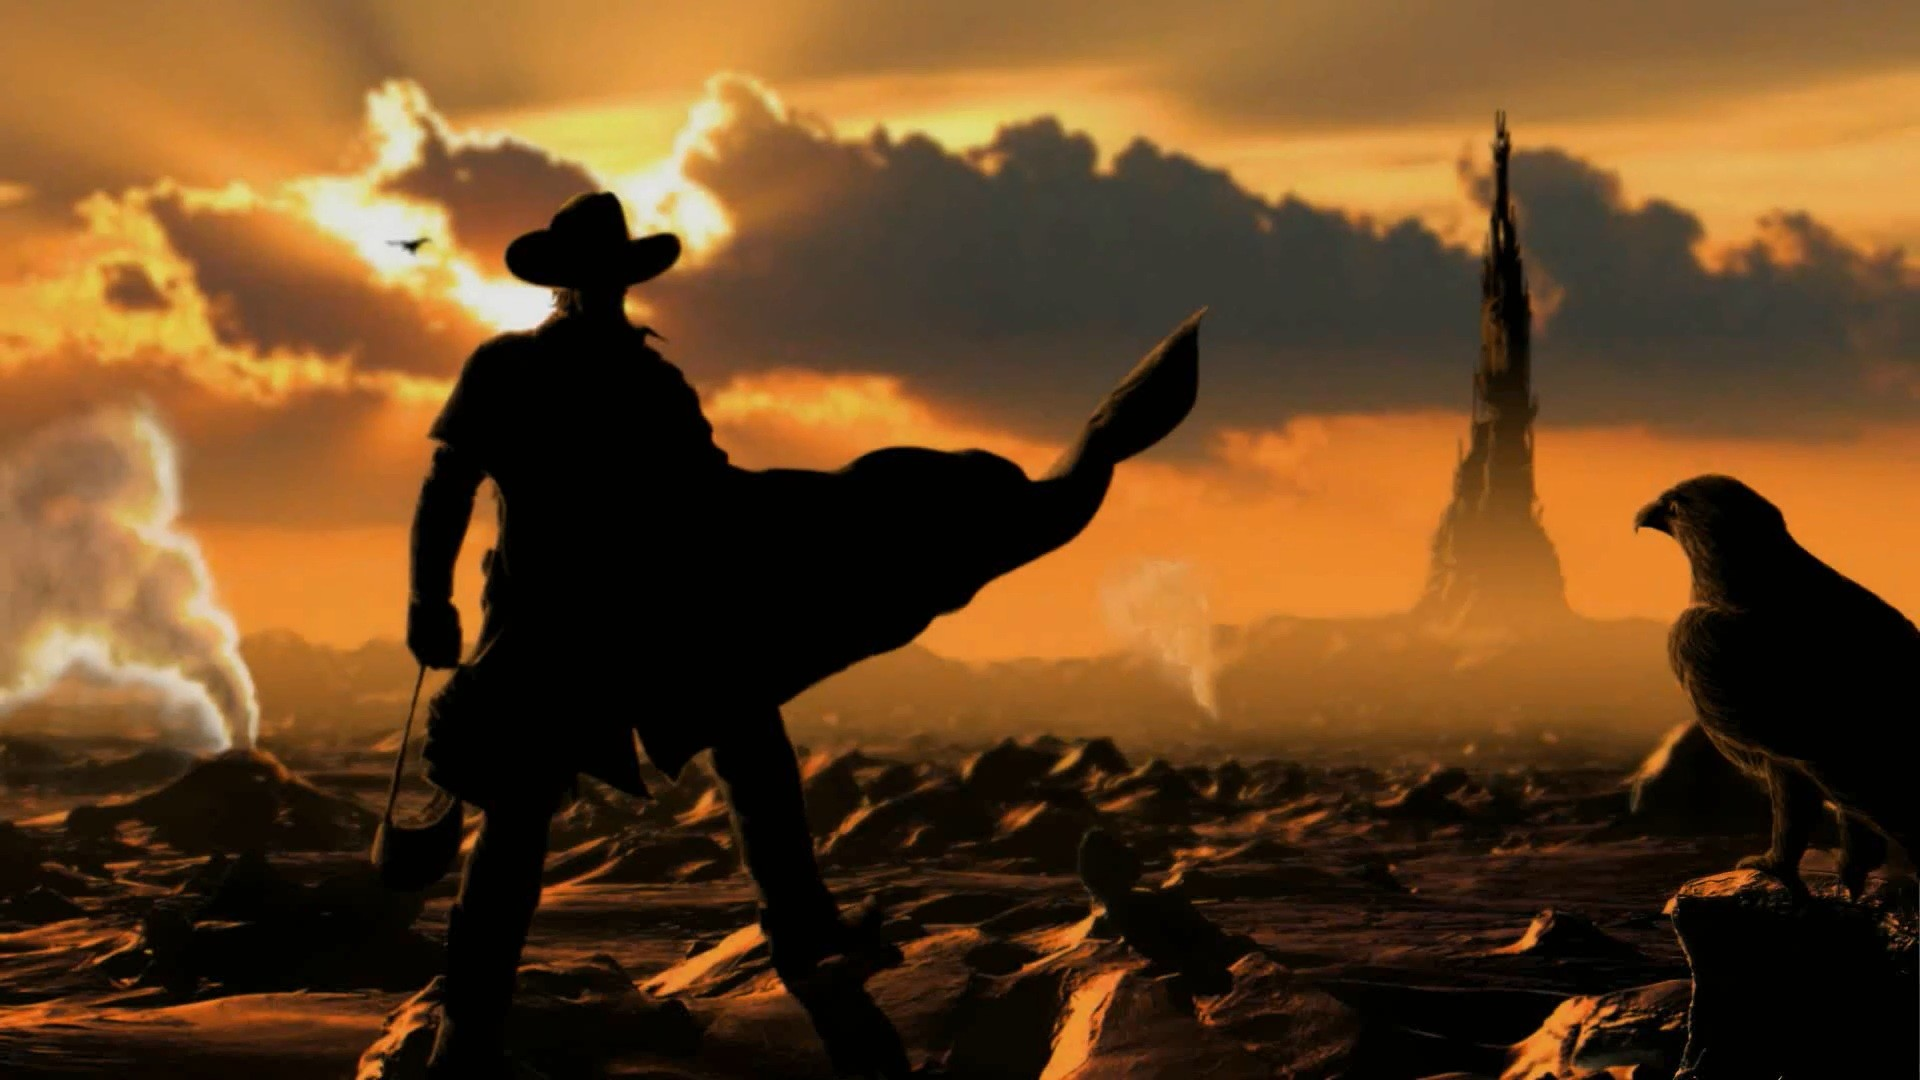 Western cowboy art wallpaper.